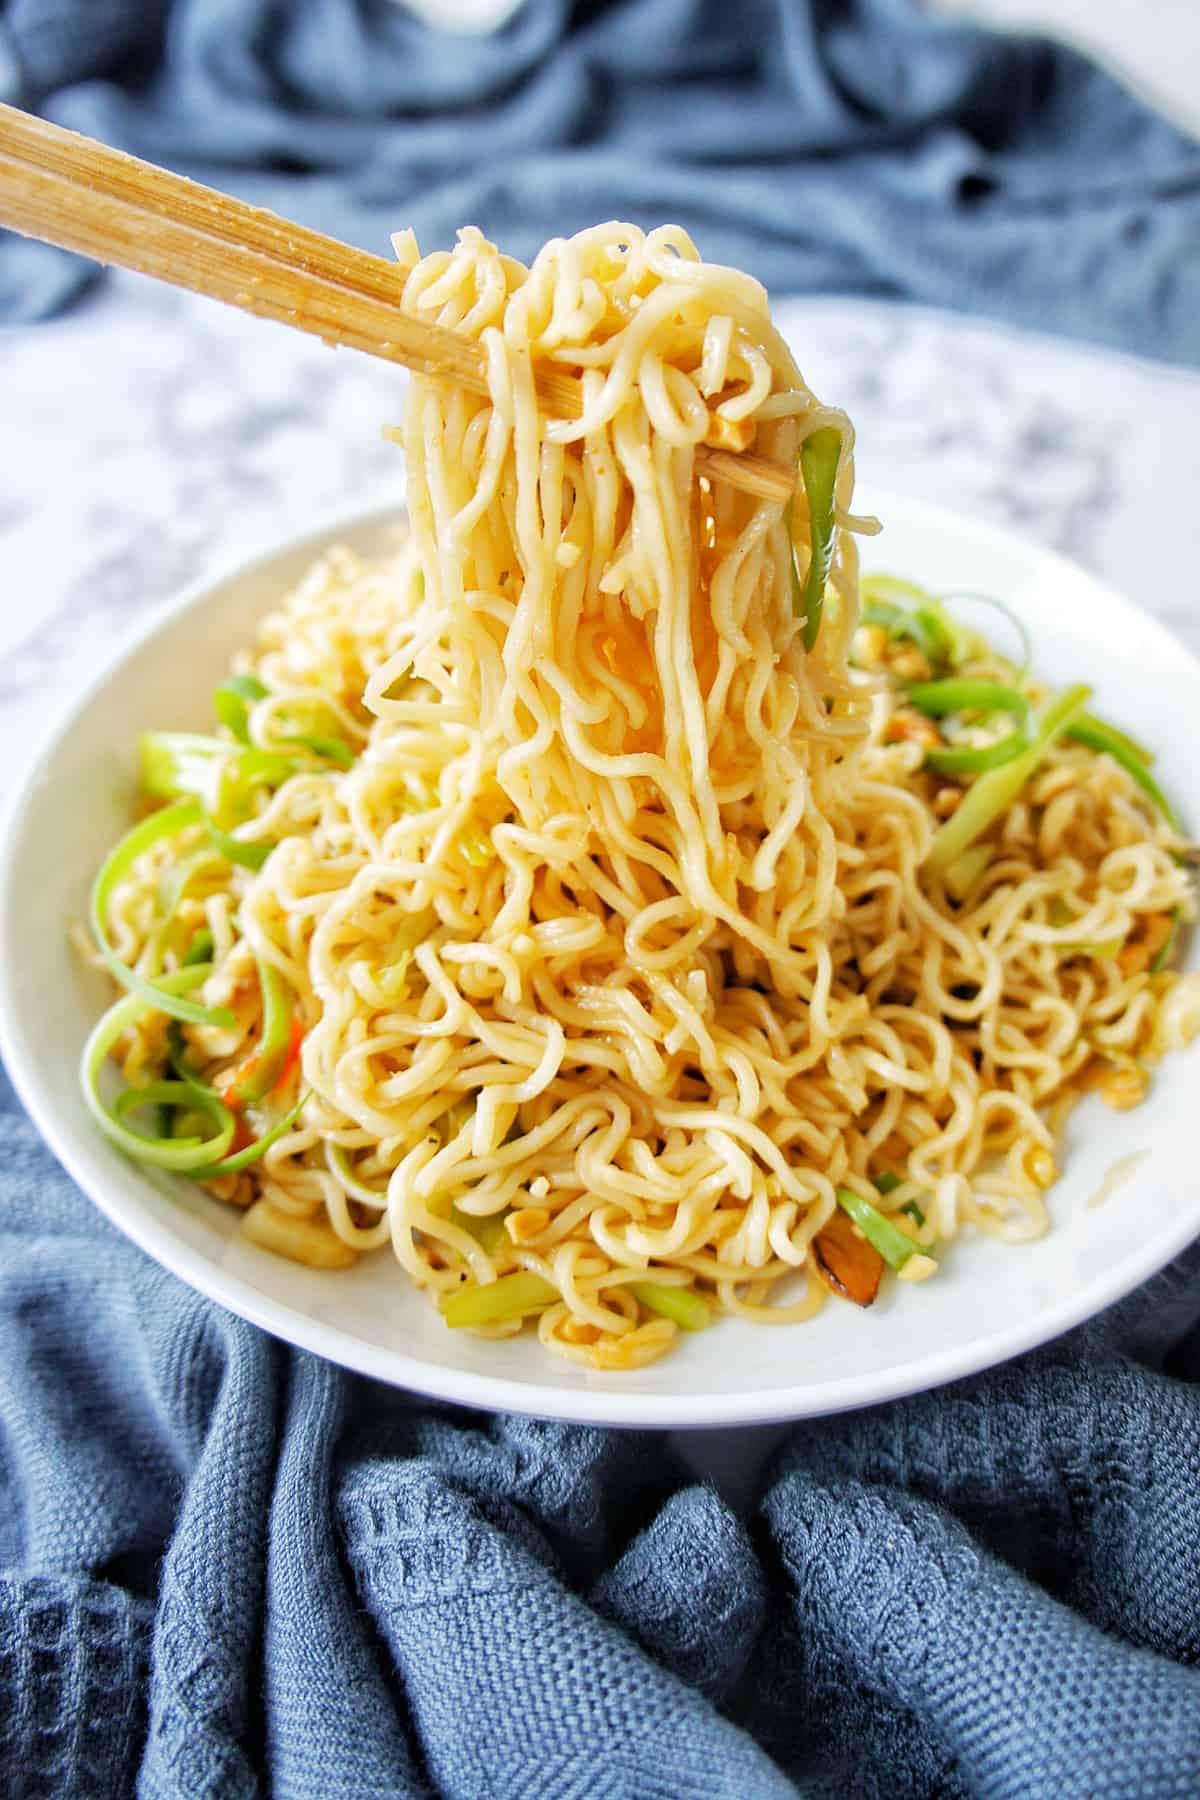 Chopsticks holding noodles over a bowl